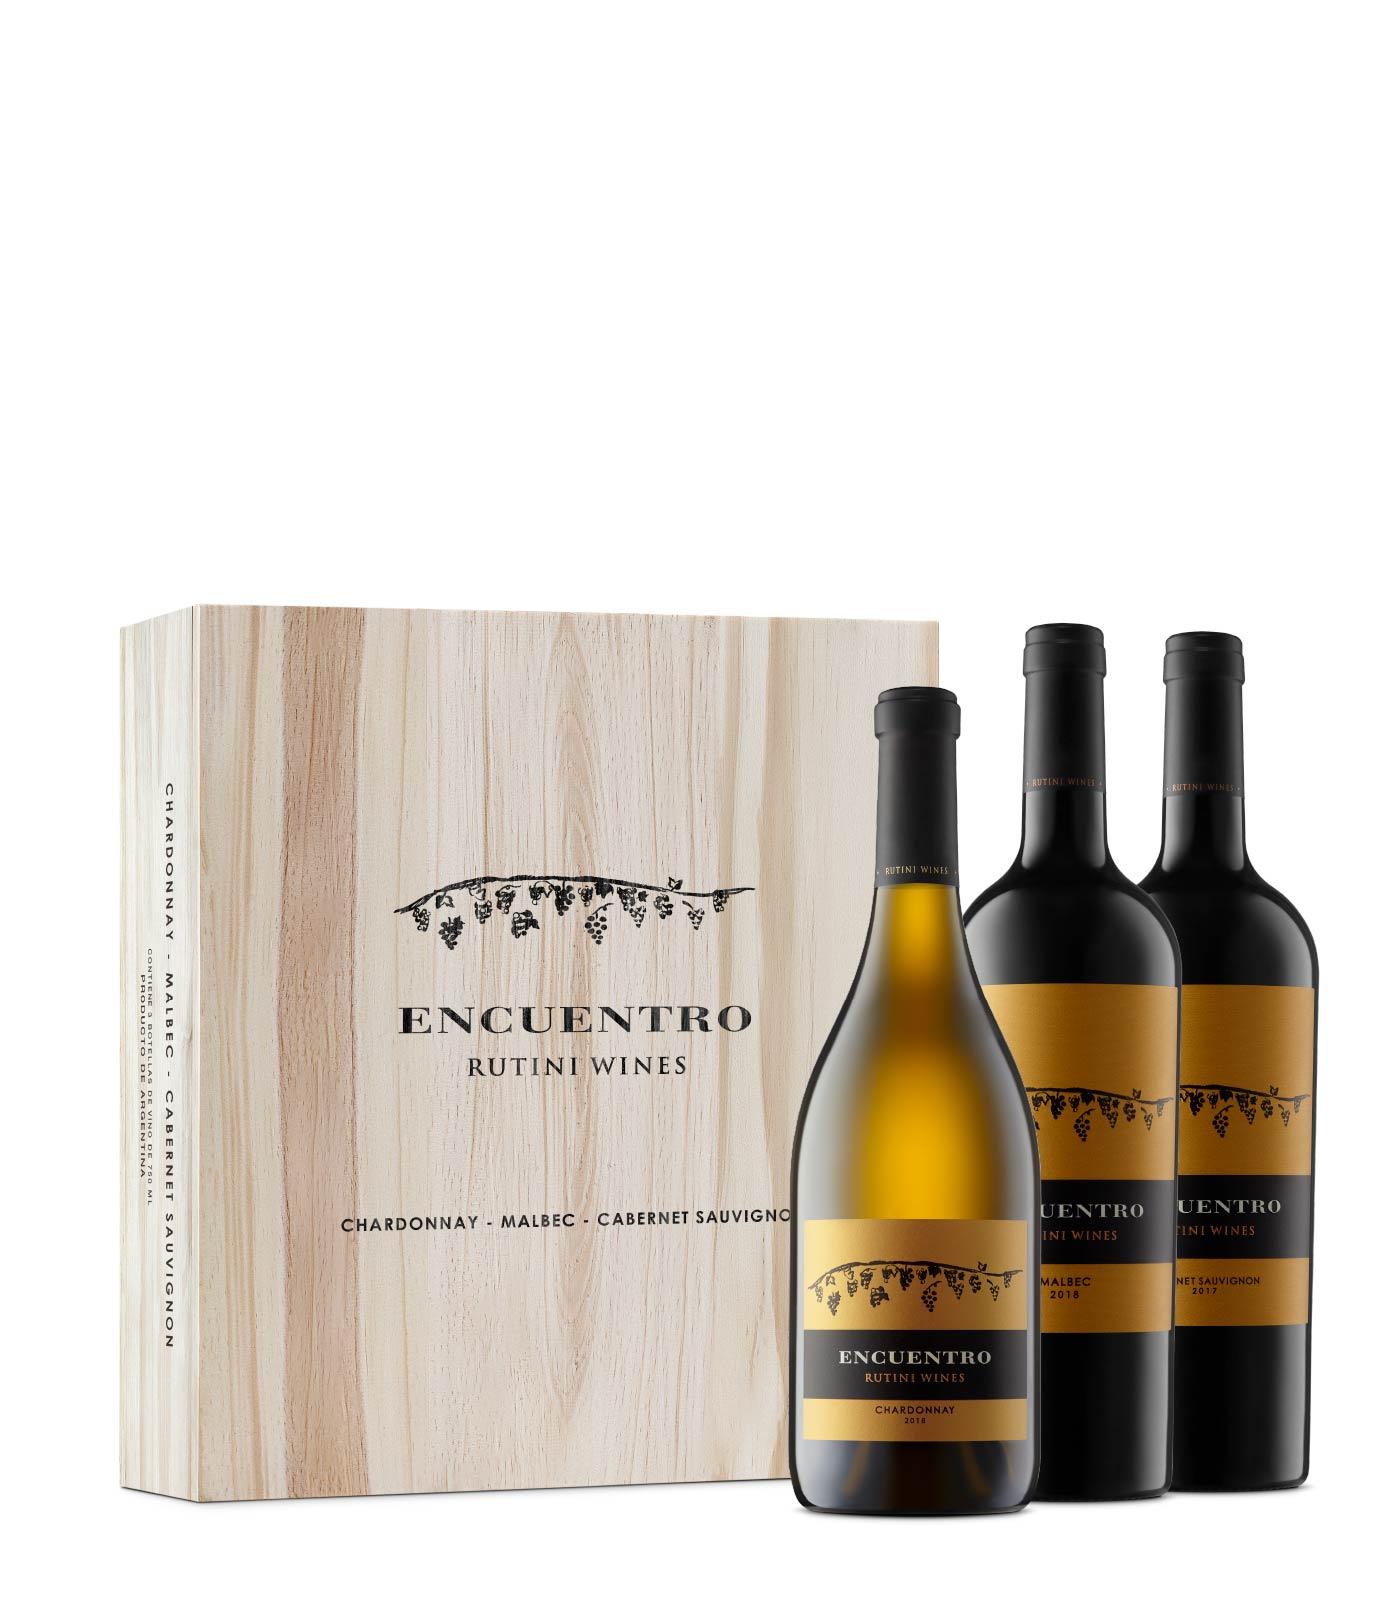 Cajon-Madera-Encuentro-Chardonnay-Malbec-Cabernet-Sauvignon-x3